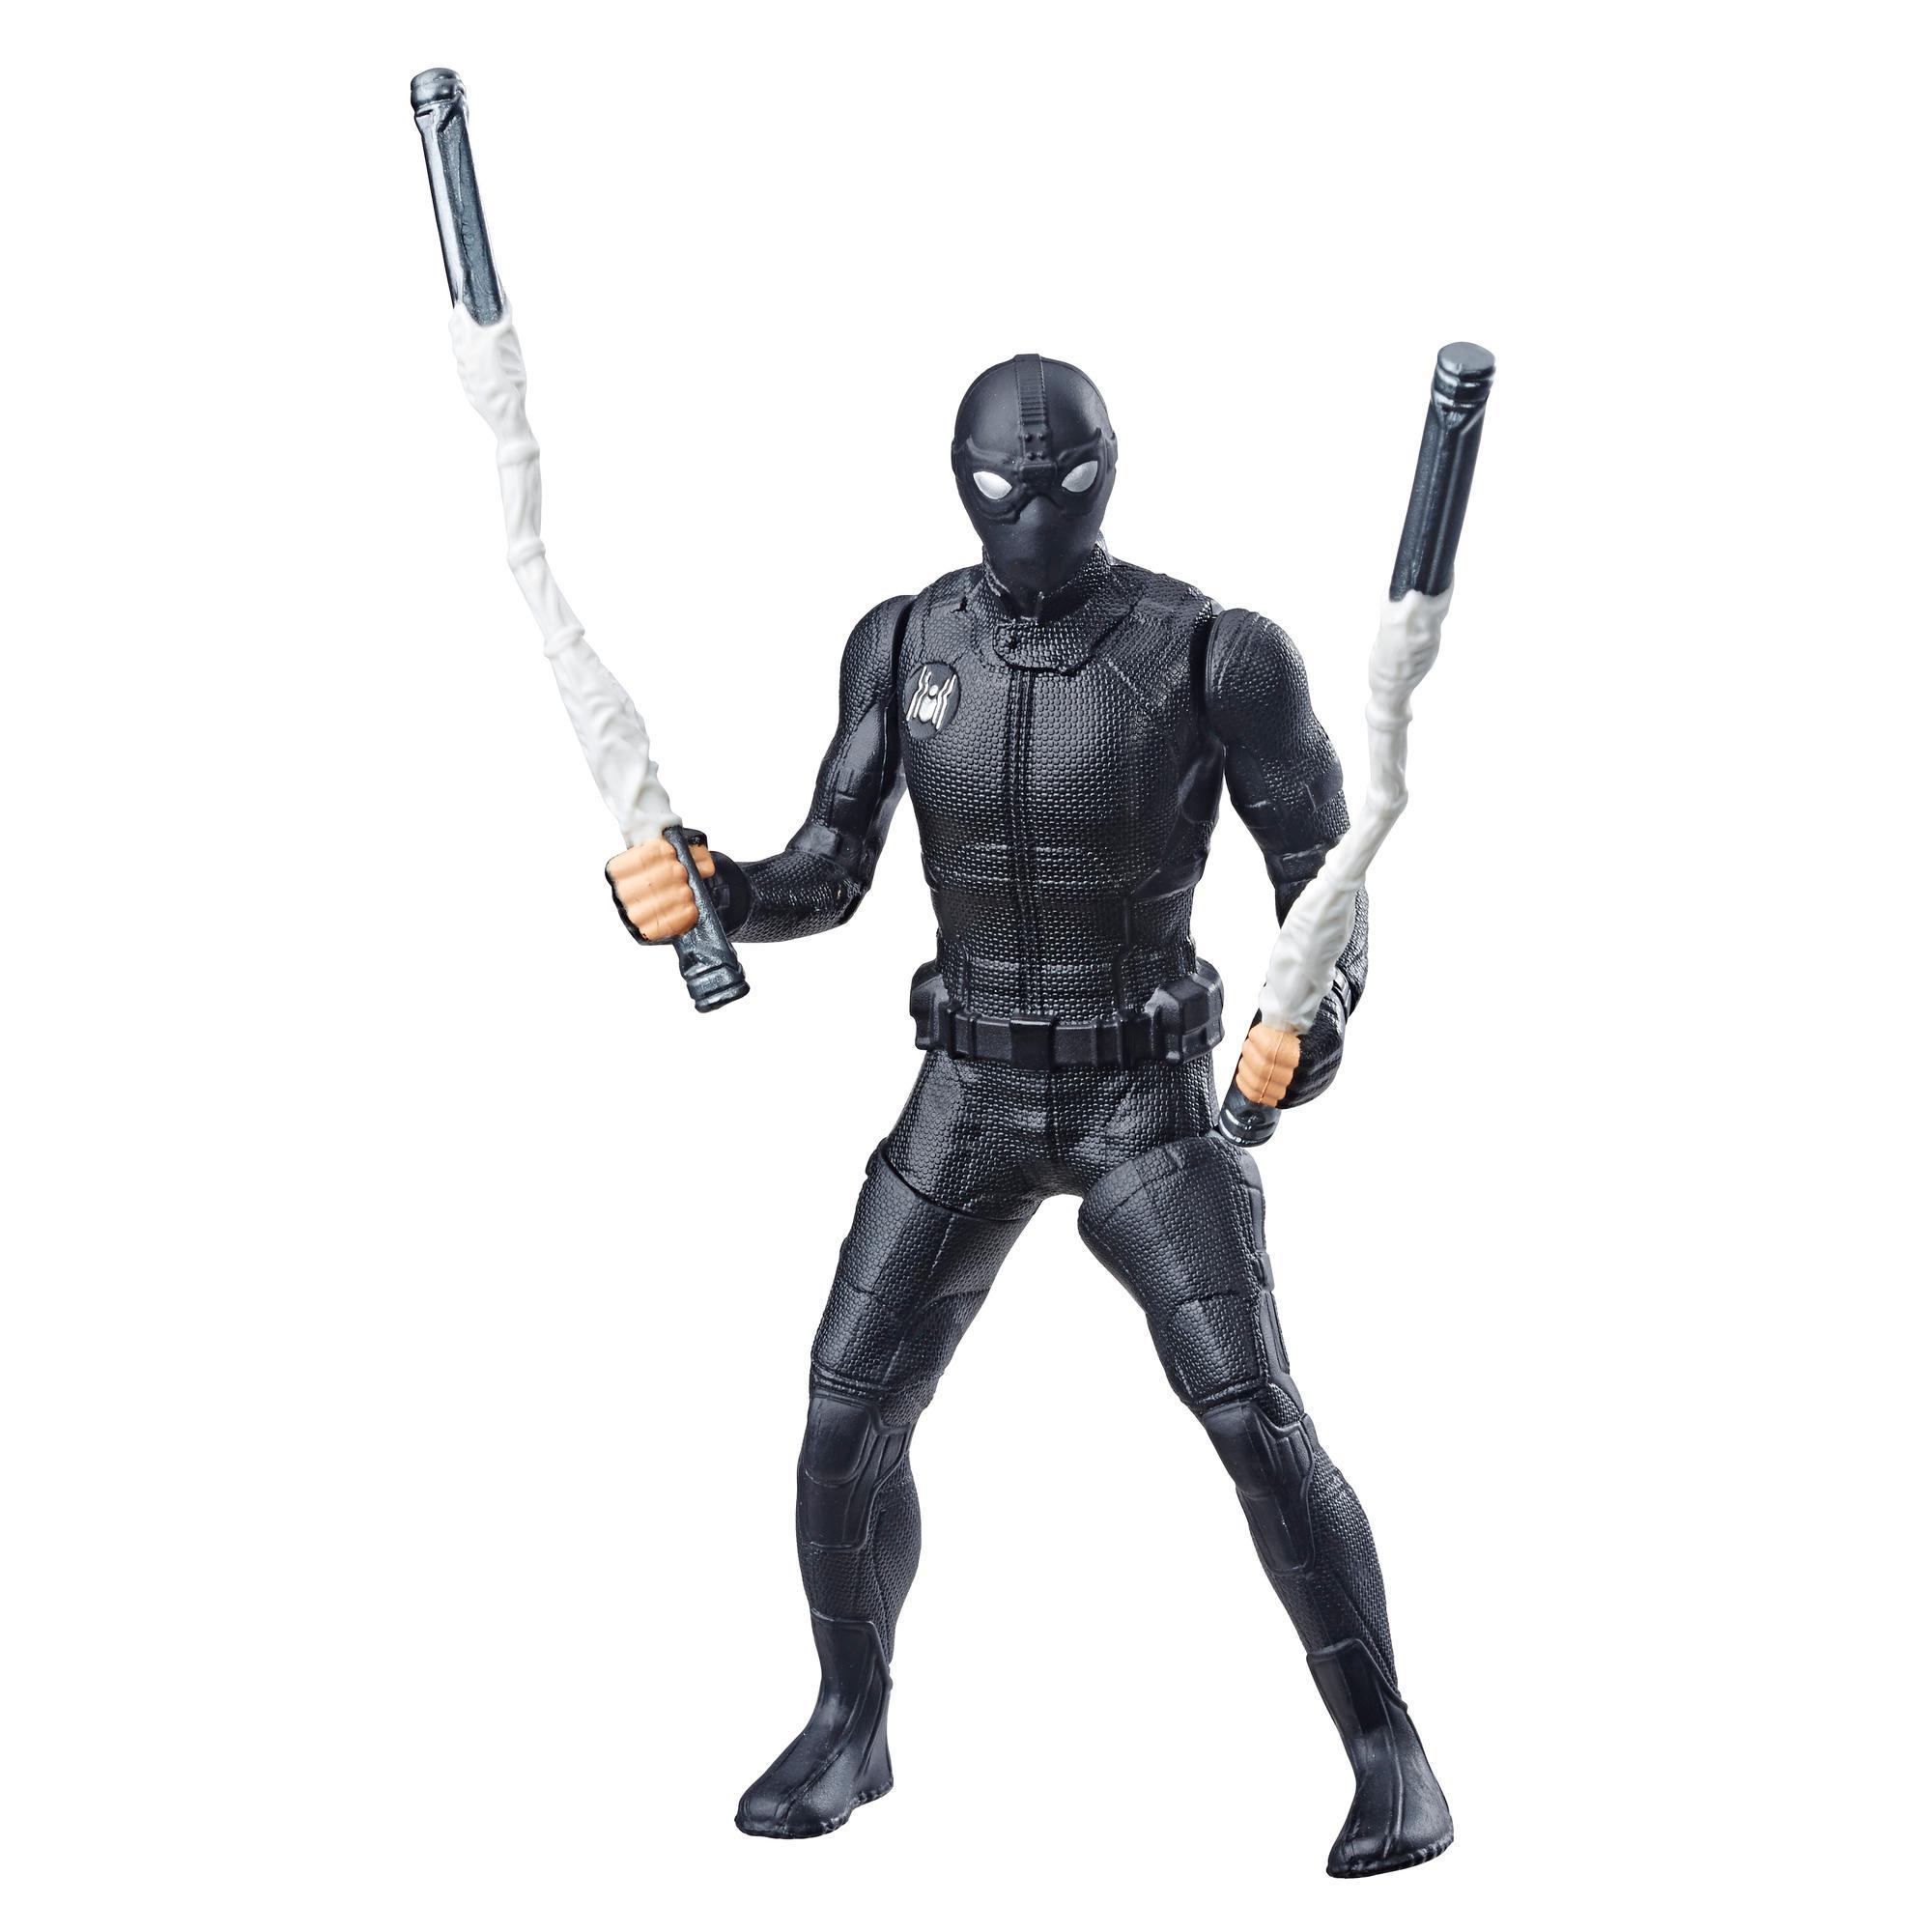 Spider-Man: Far From Home Web Strike Spider-Man 6-Inch Action Figure